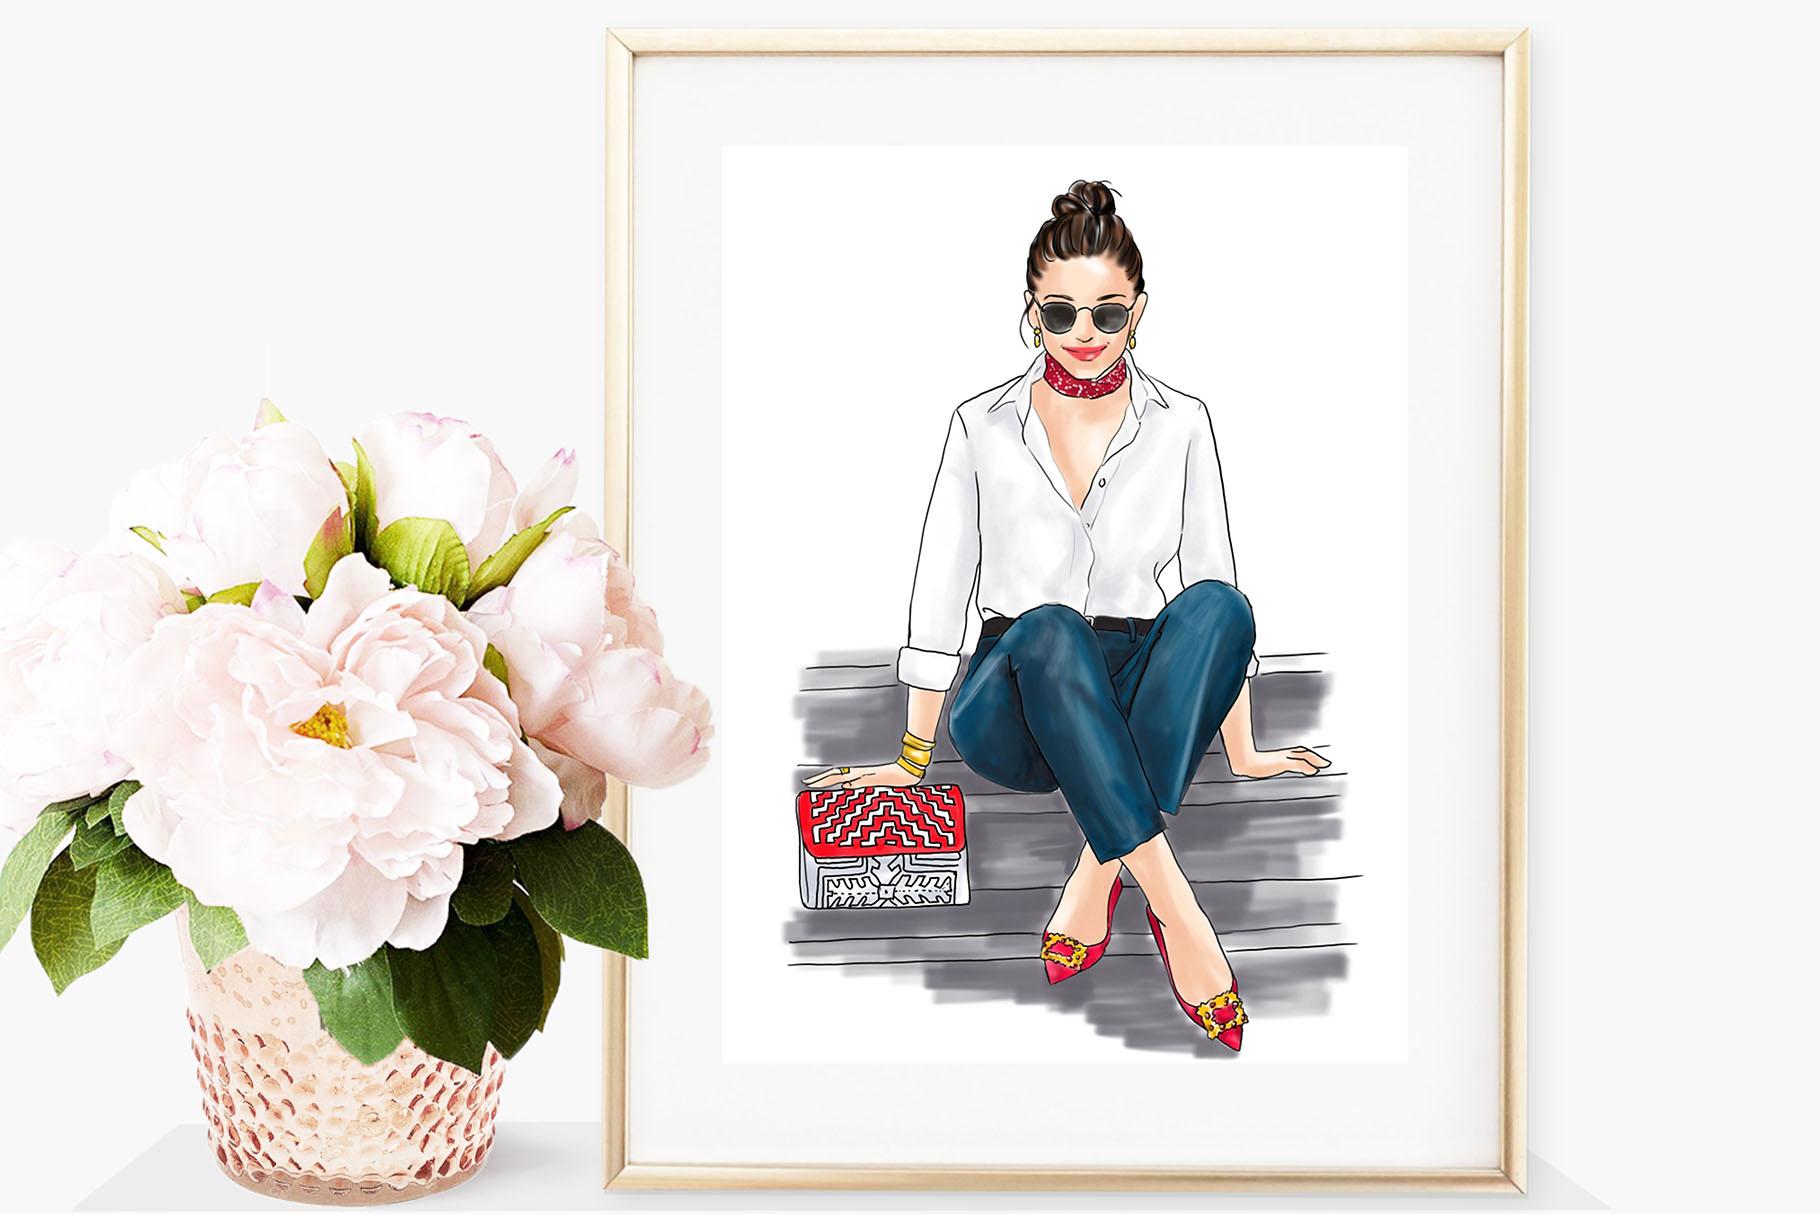 Fashion illustration - Girl in White Shirt & Jeans - Light example image 4